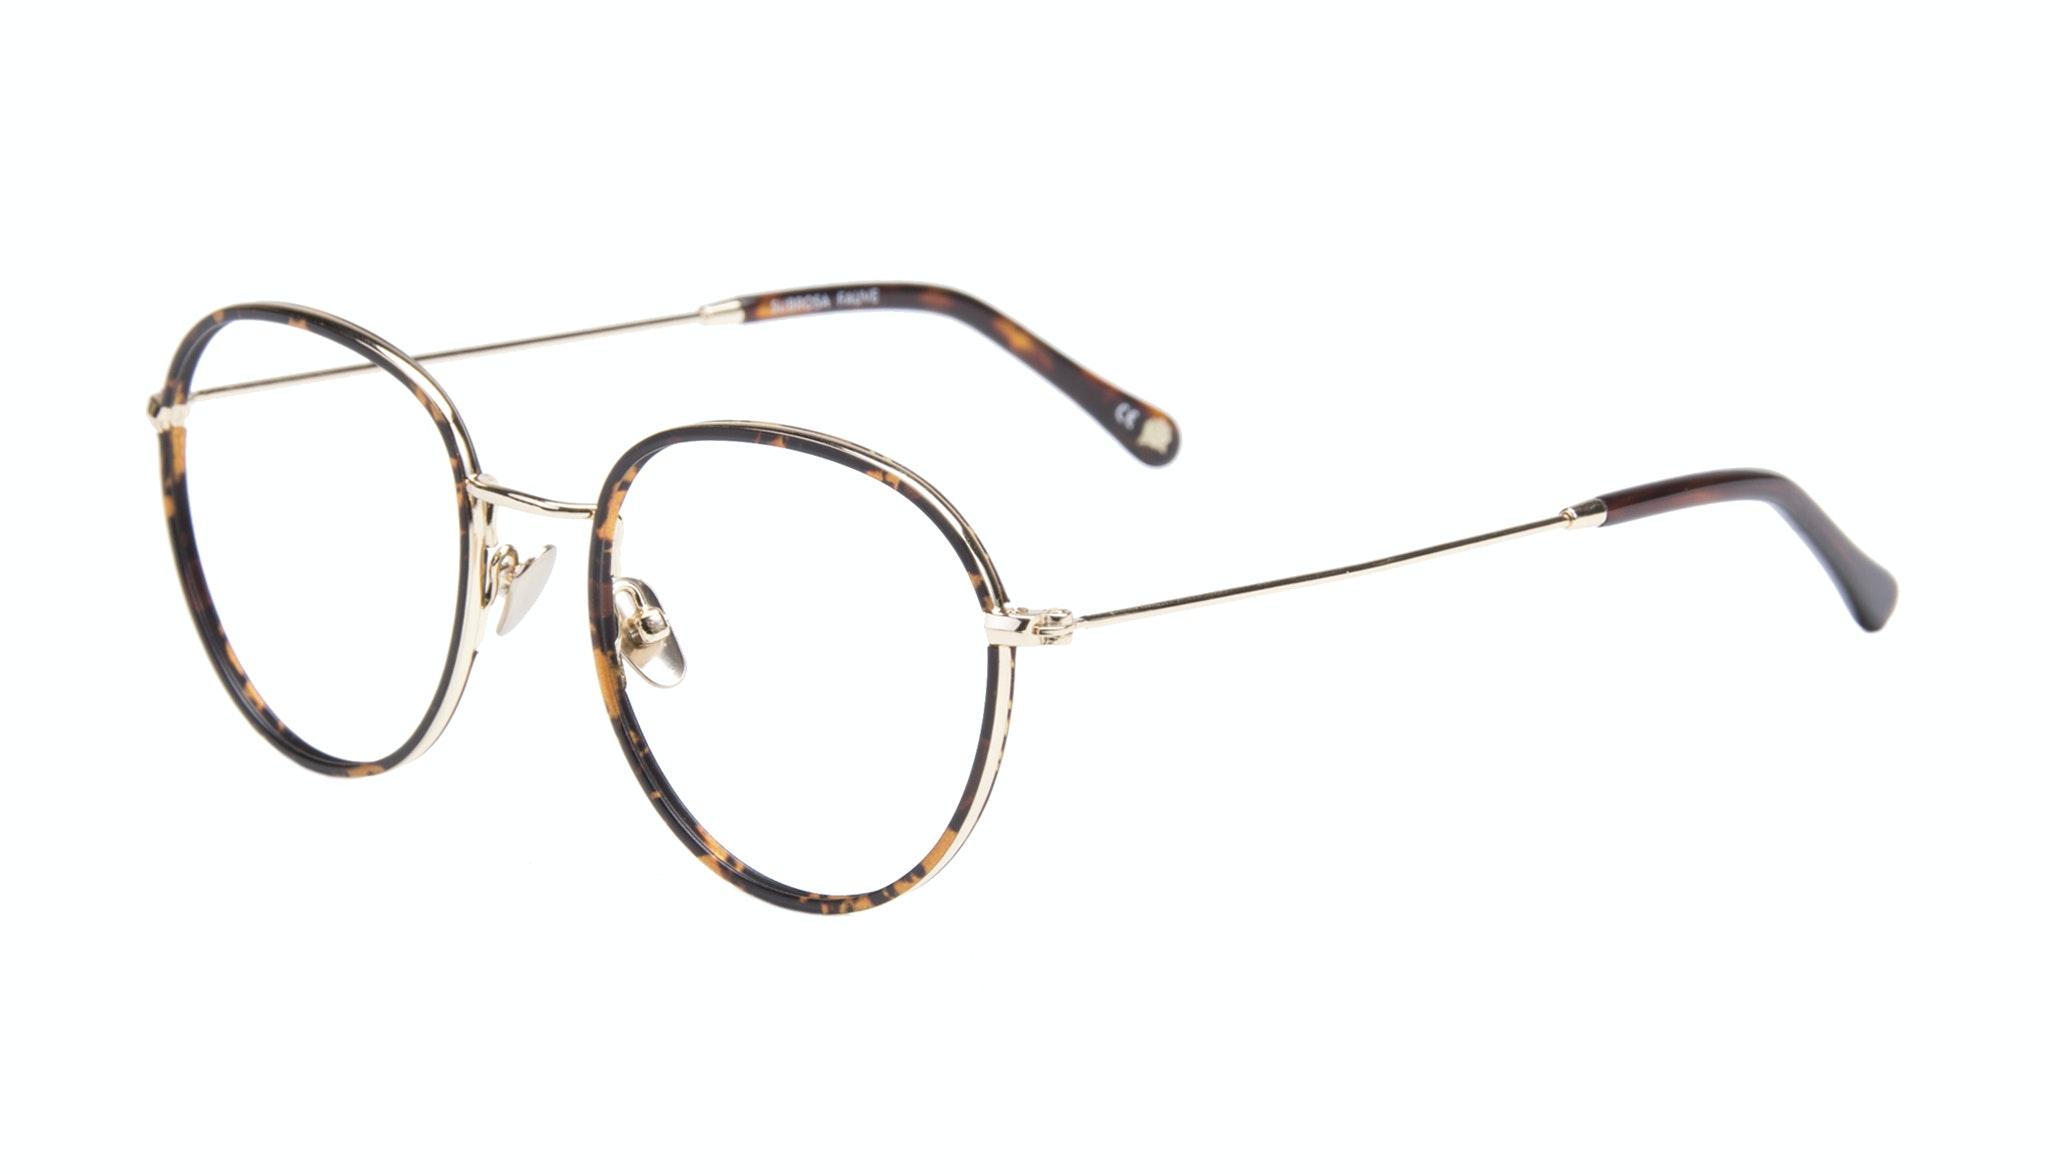 Affordable Fashion Glasses Aviator Round Eyeglasses Women Subrosa Fauve Tilt